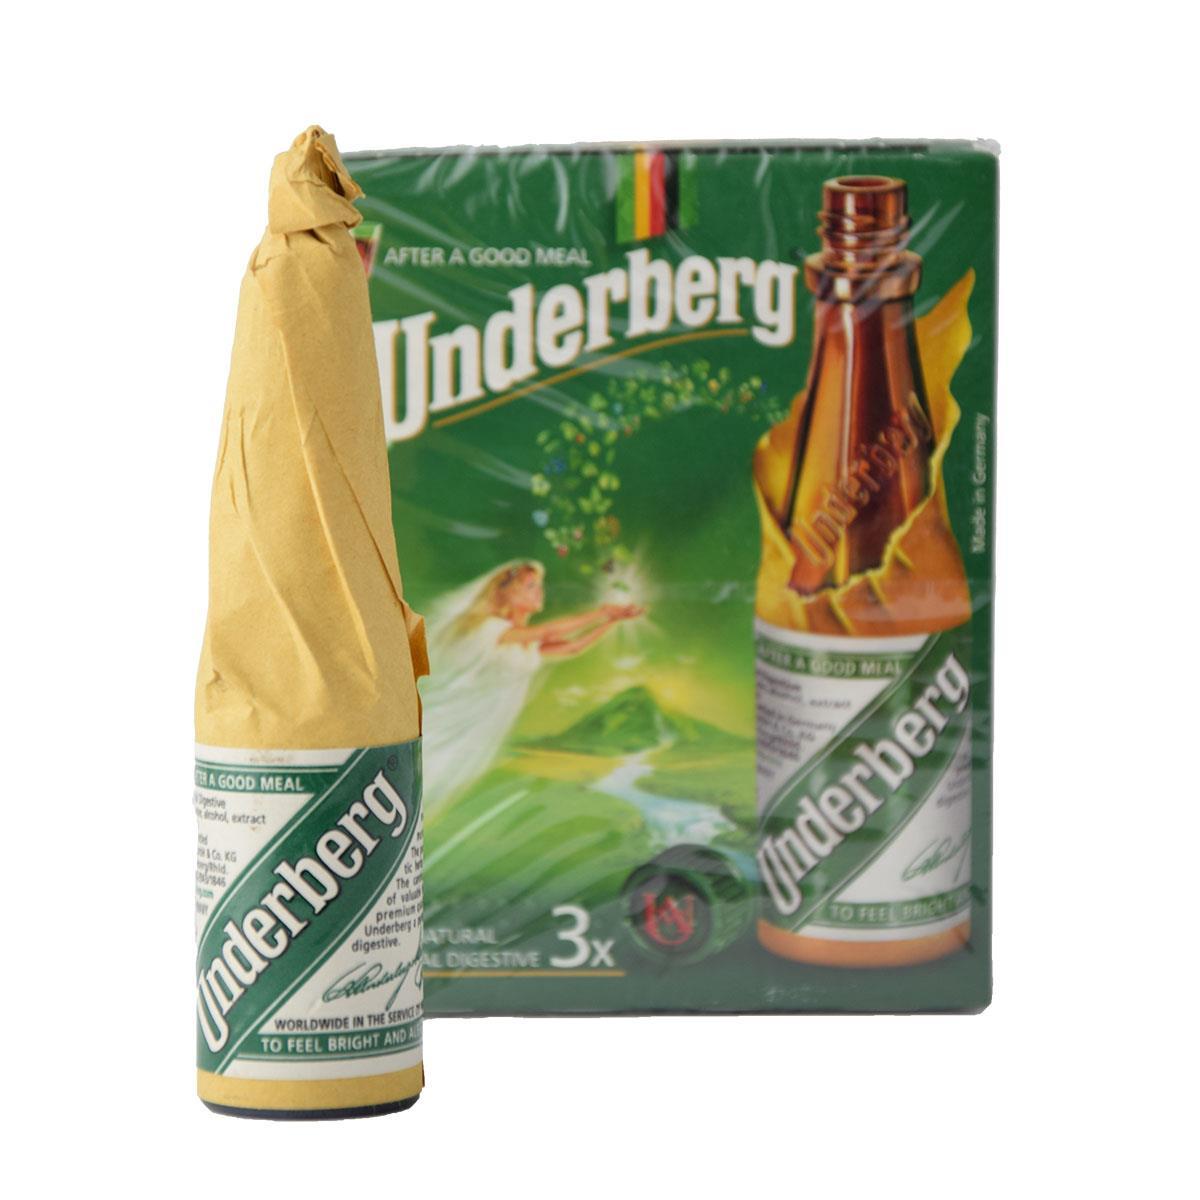 Underberg 3x20ml